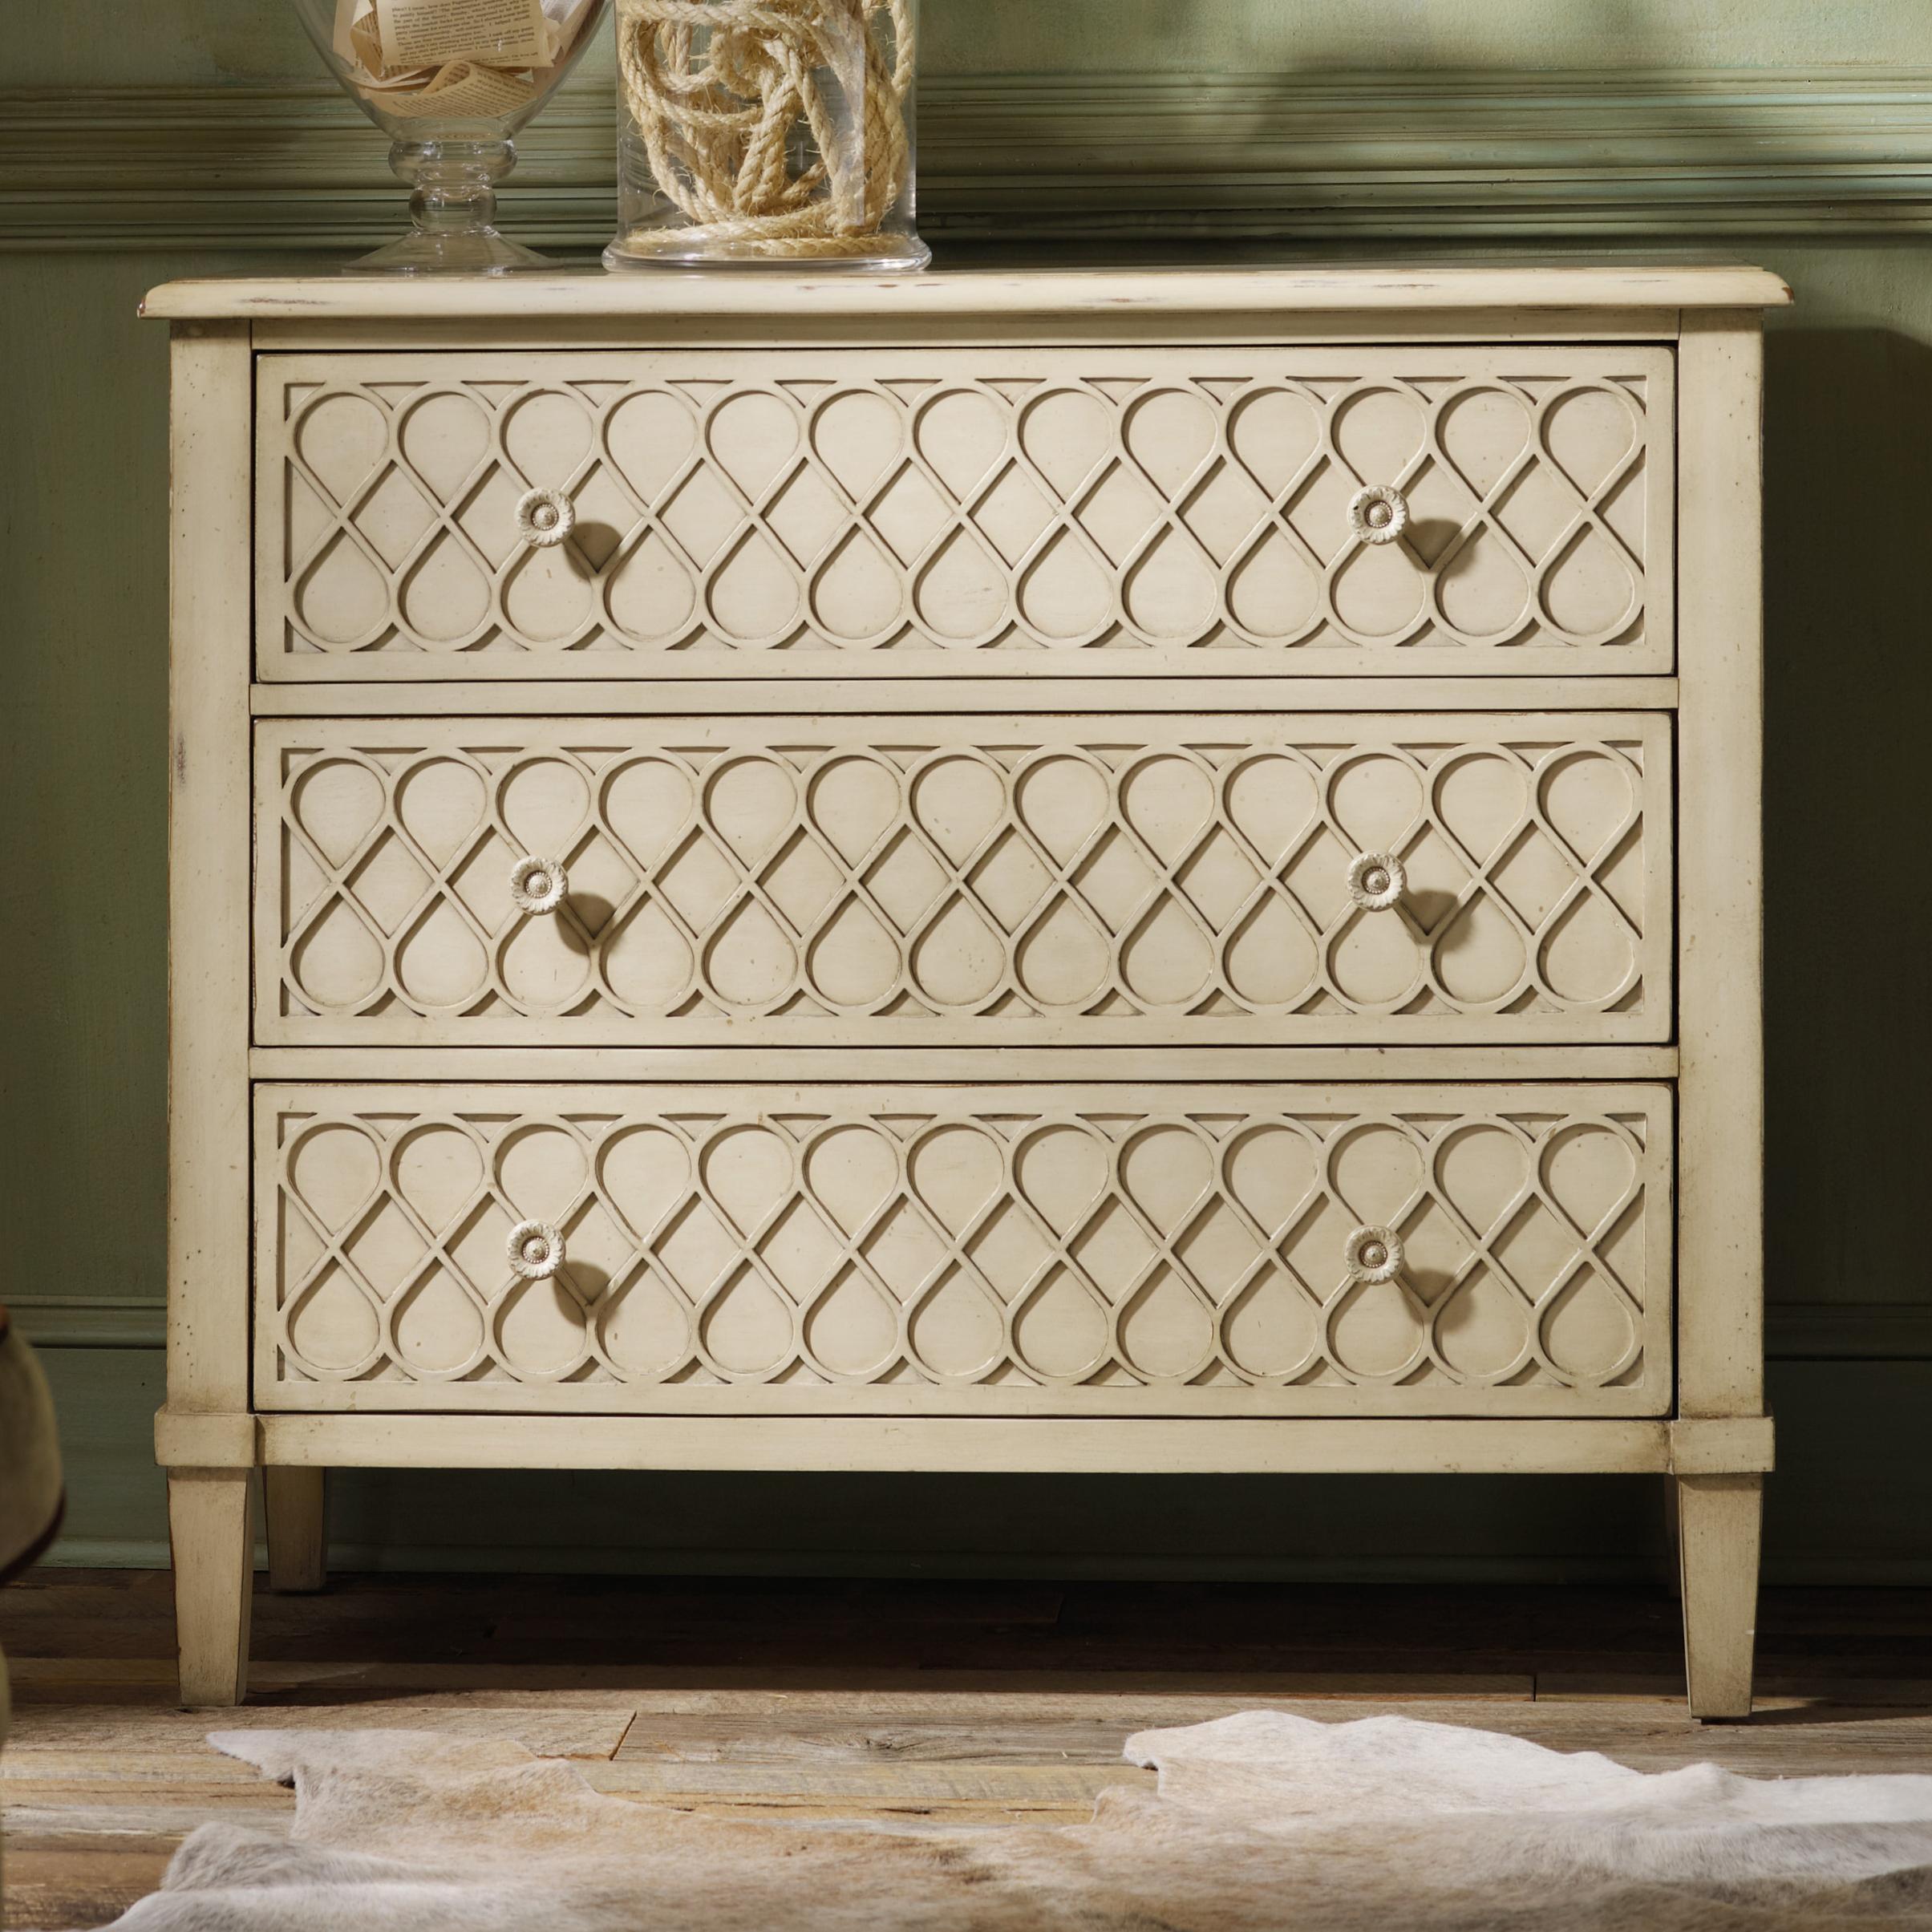 Hooker Furniture Mélange Raised Lattice Front 3 Drawer Chest